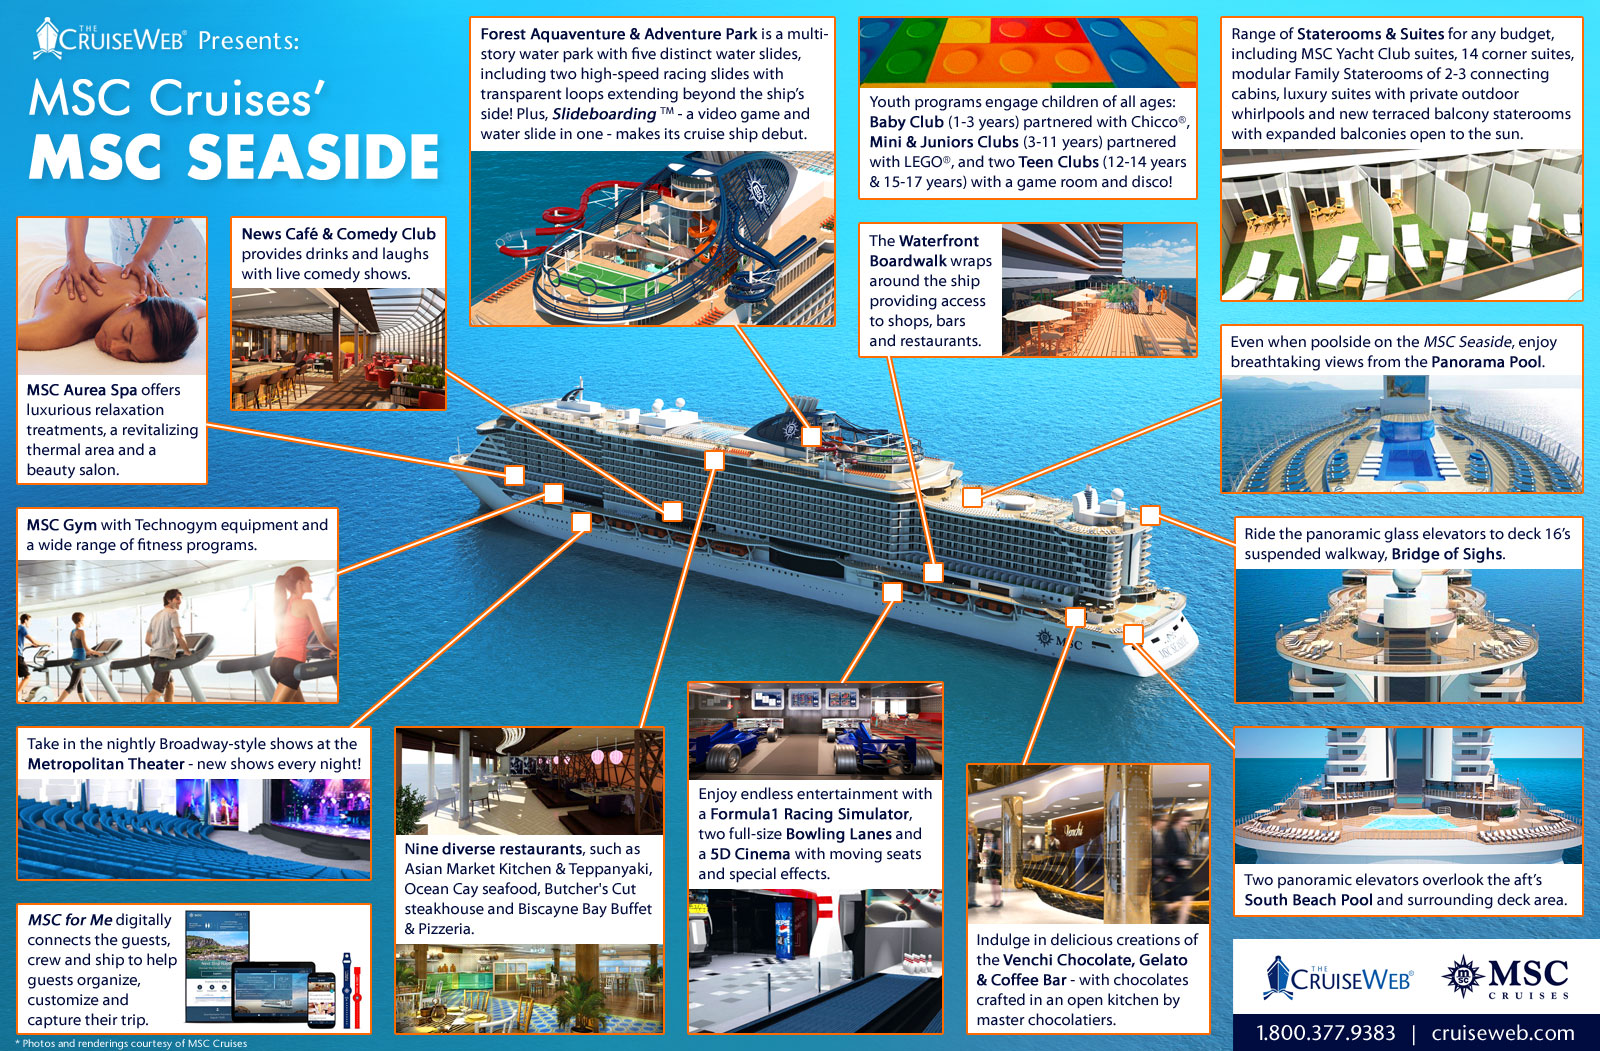 MSC Seaside Cruise Ship 2019 And 2020 MSC Seaside